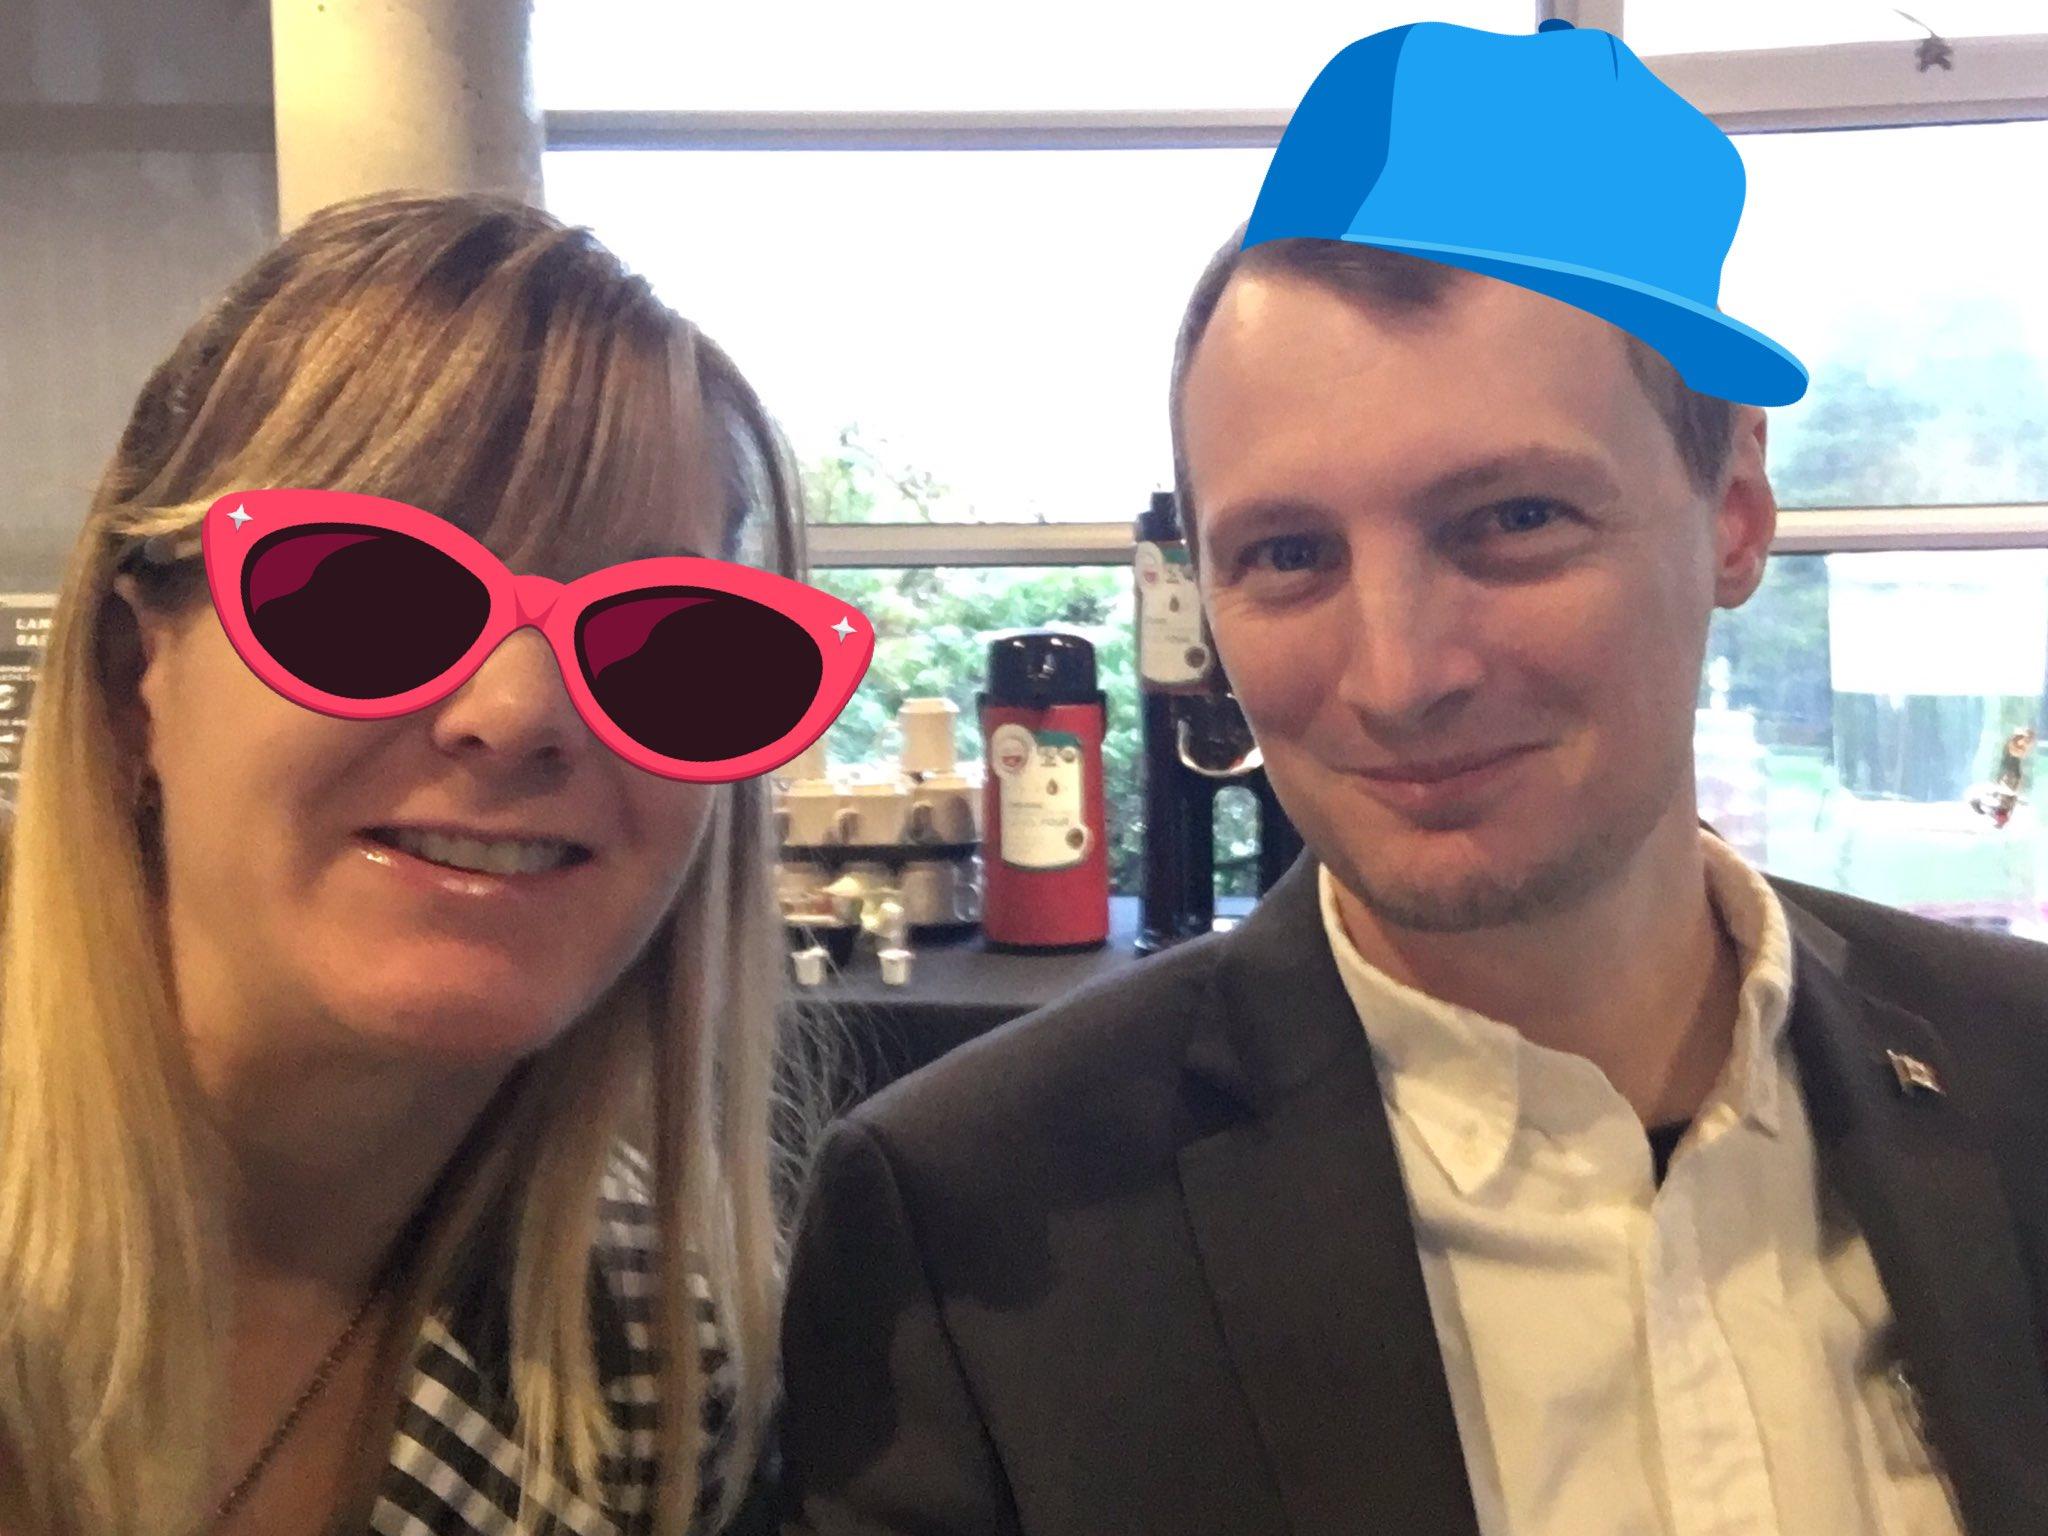 Selfie time!! #HESM16 #socialmediamarketing #SFU @higheredexperts https://t.co/6n2uGMbcRb